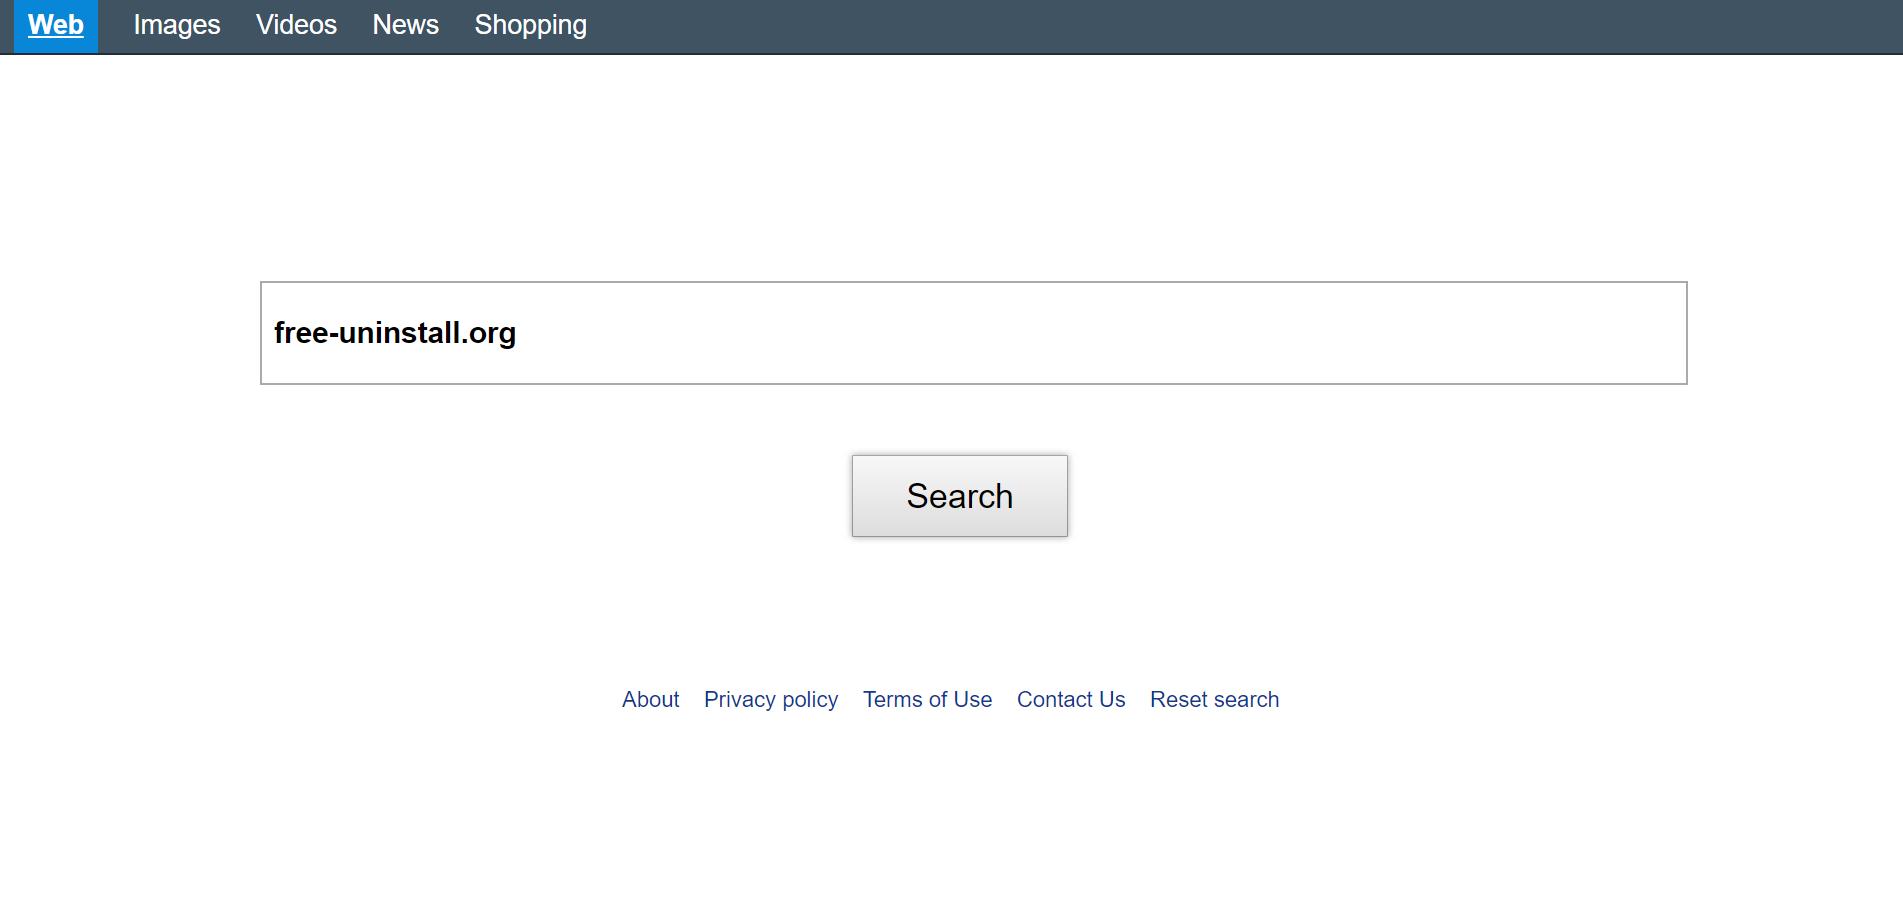 Search.pitchofcase.com Hijacker